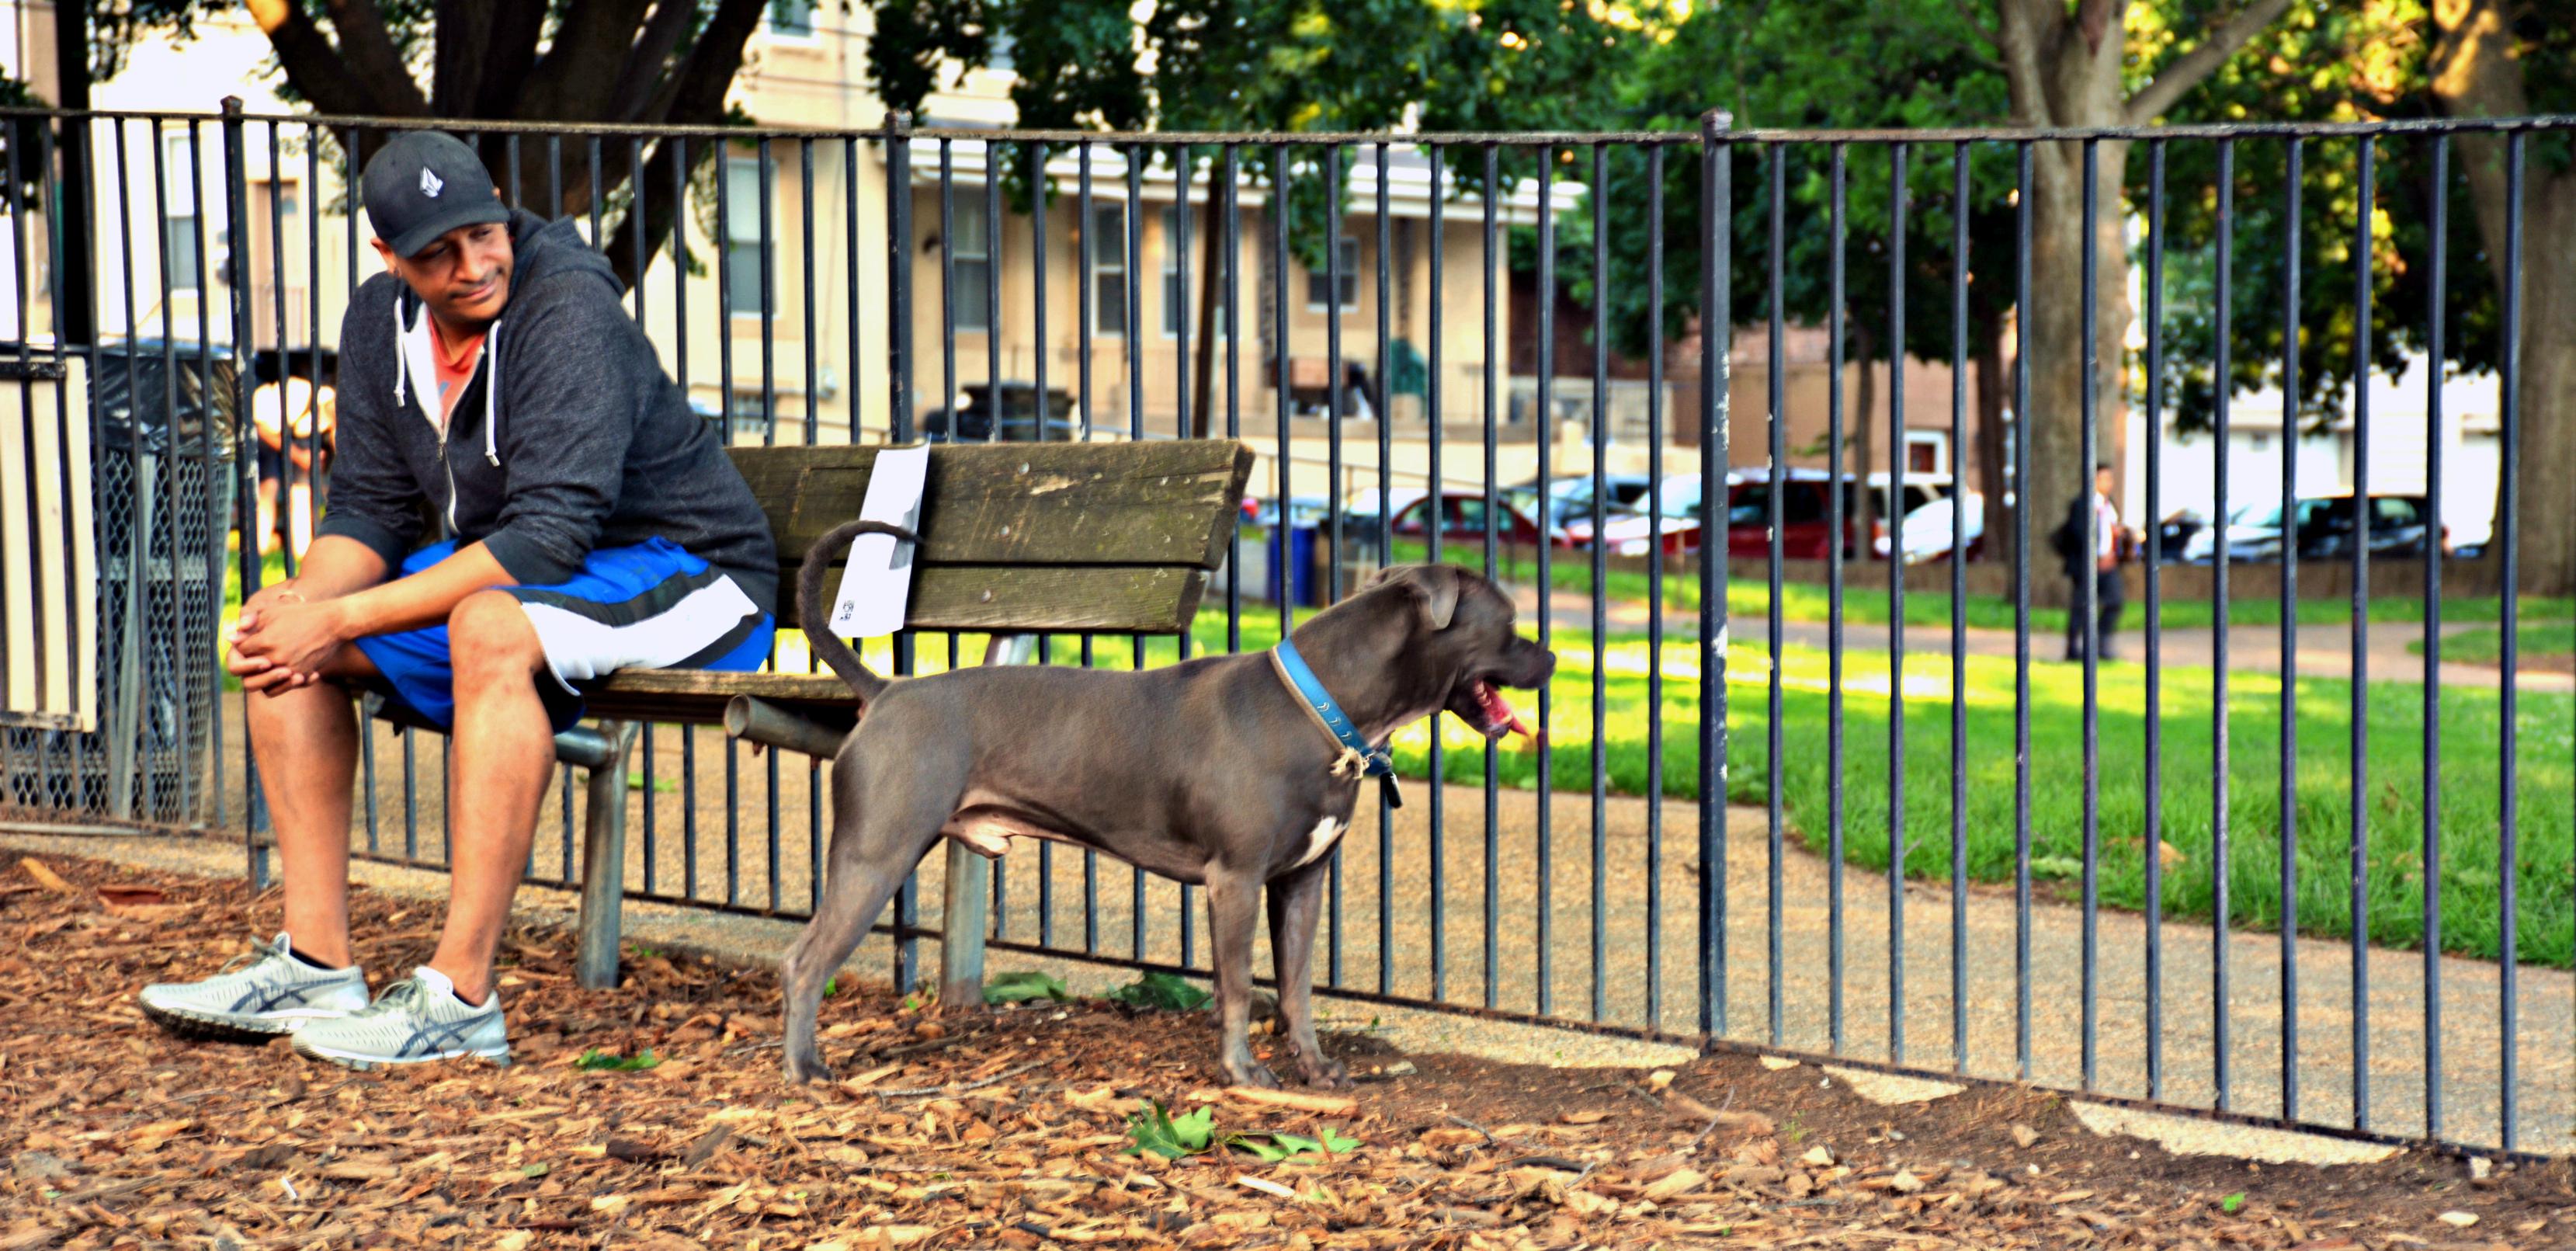 EastFallsLocal 6-9 pretzel park dog park crop